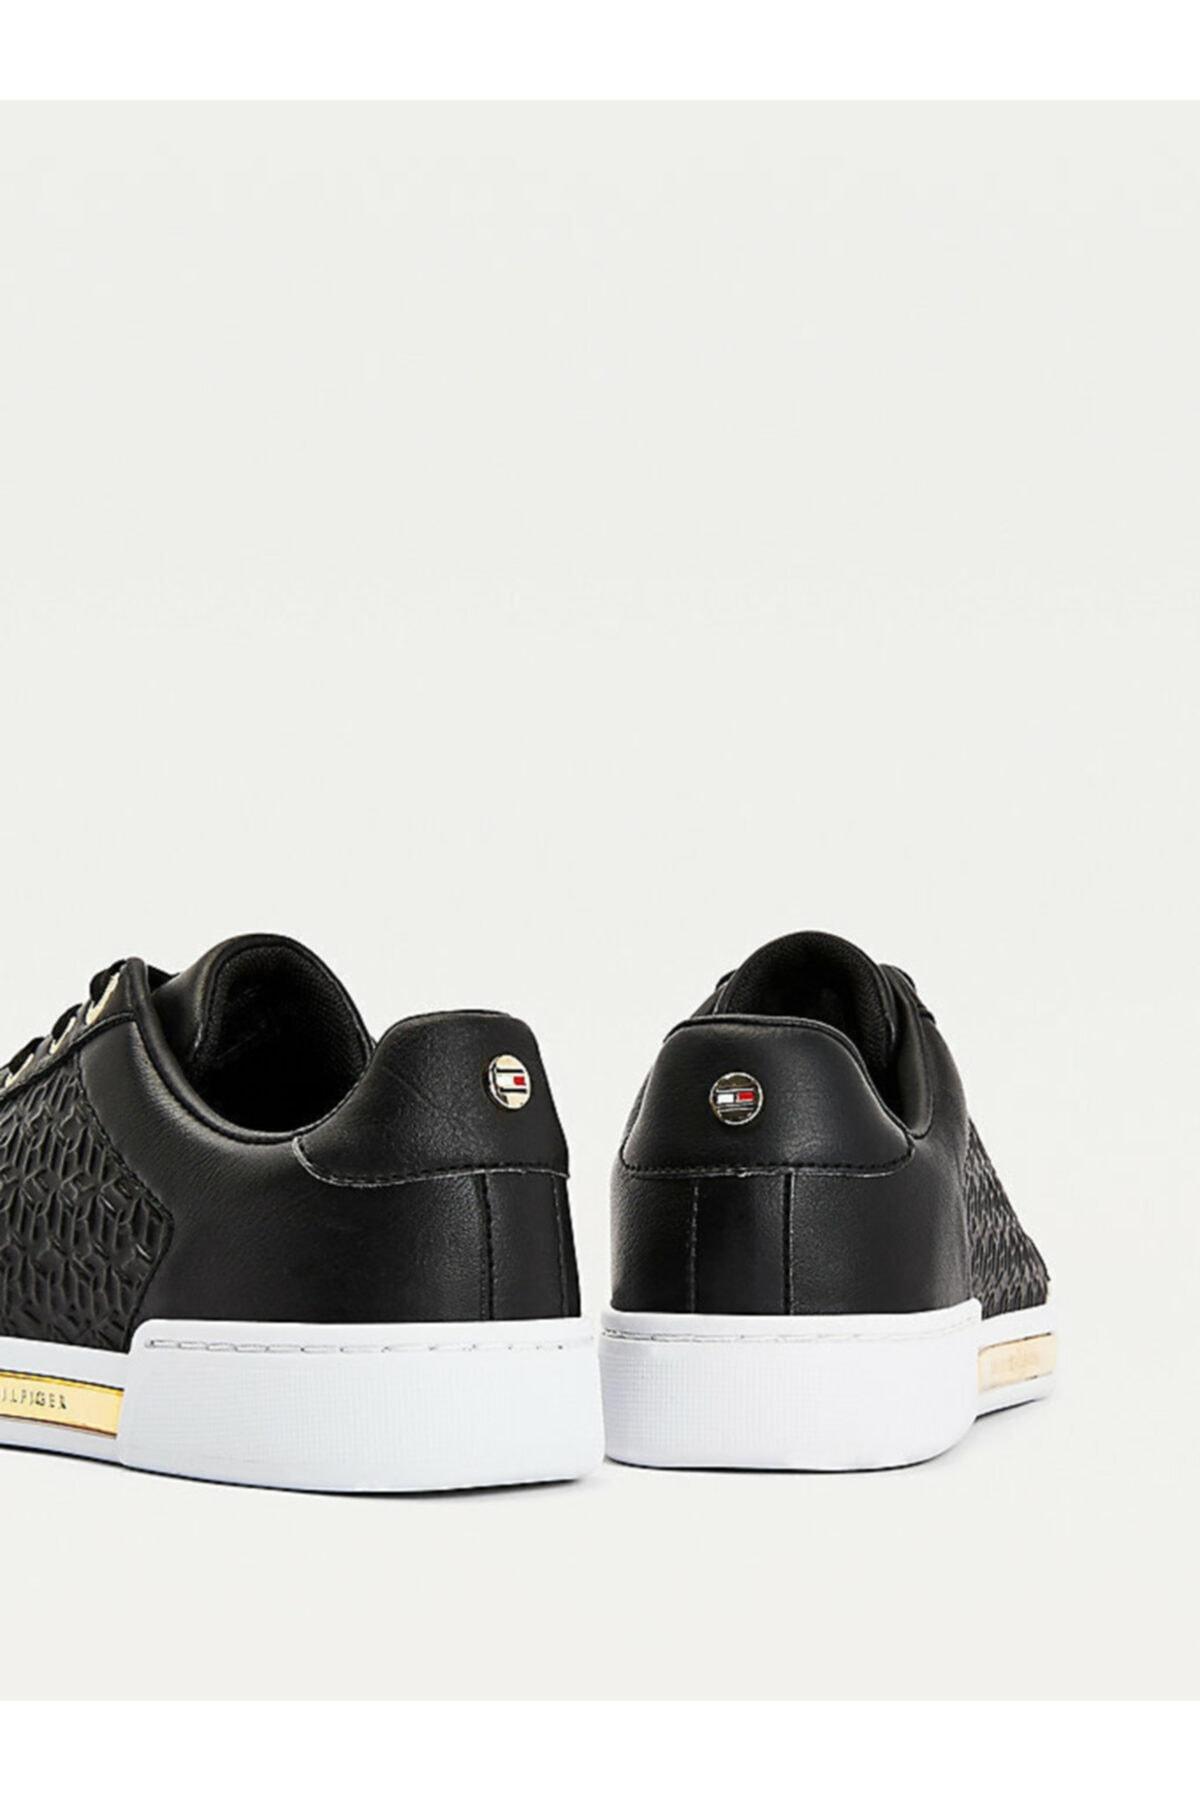 Tommy Hilfiger Th Monogram Elevated Sneaker 2